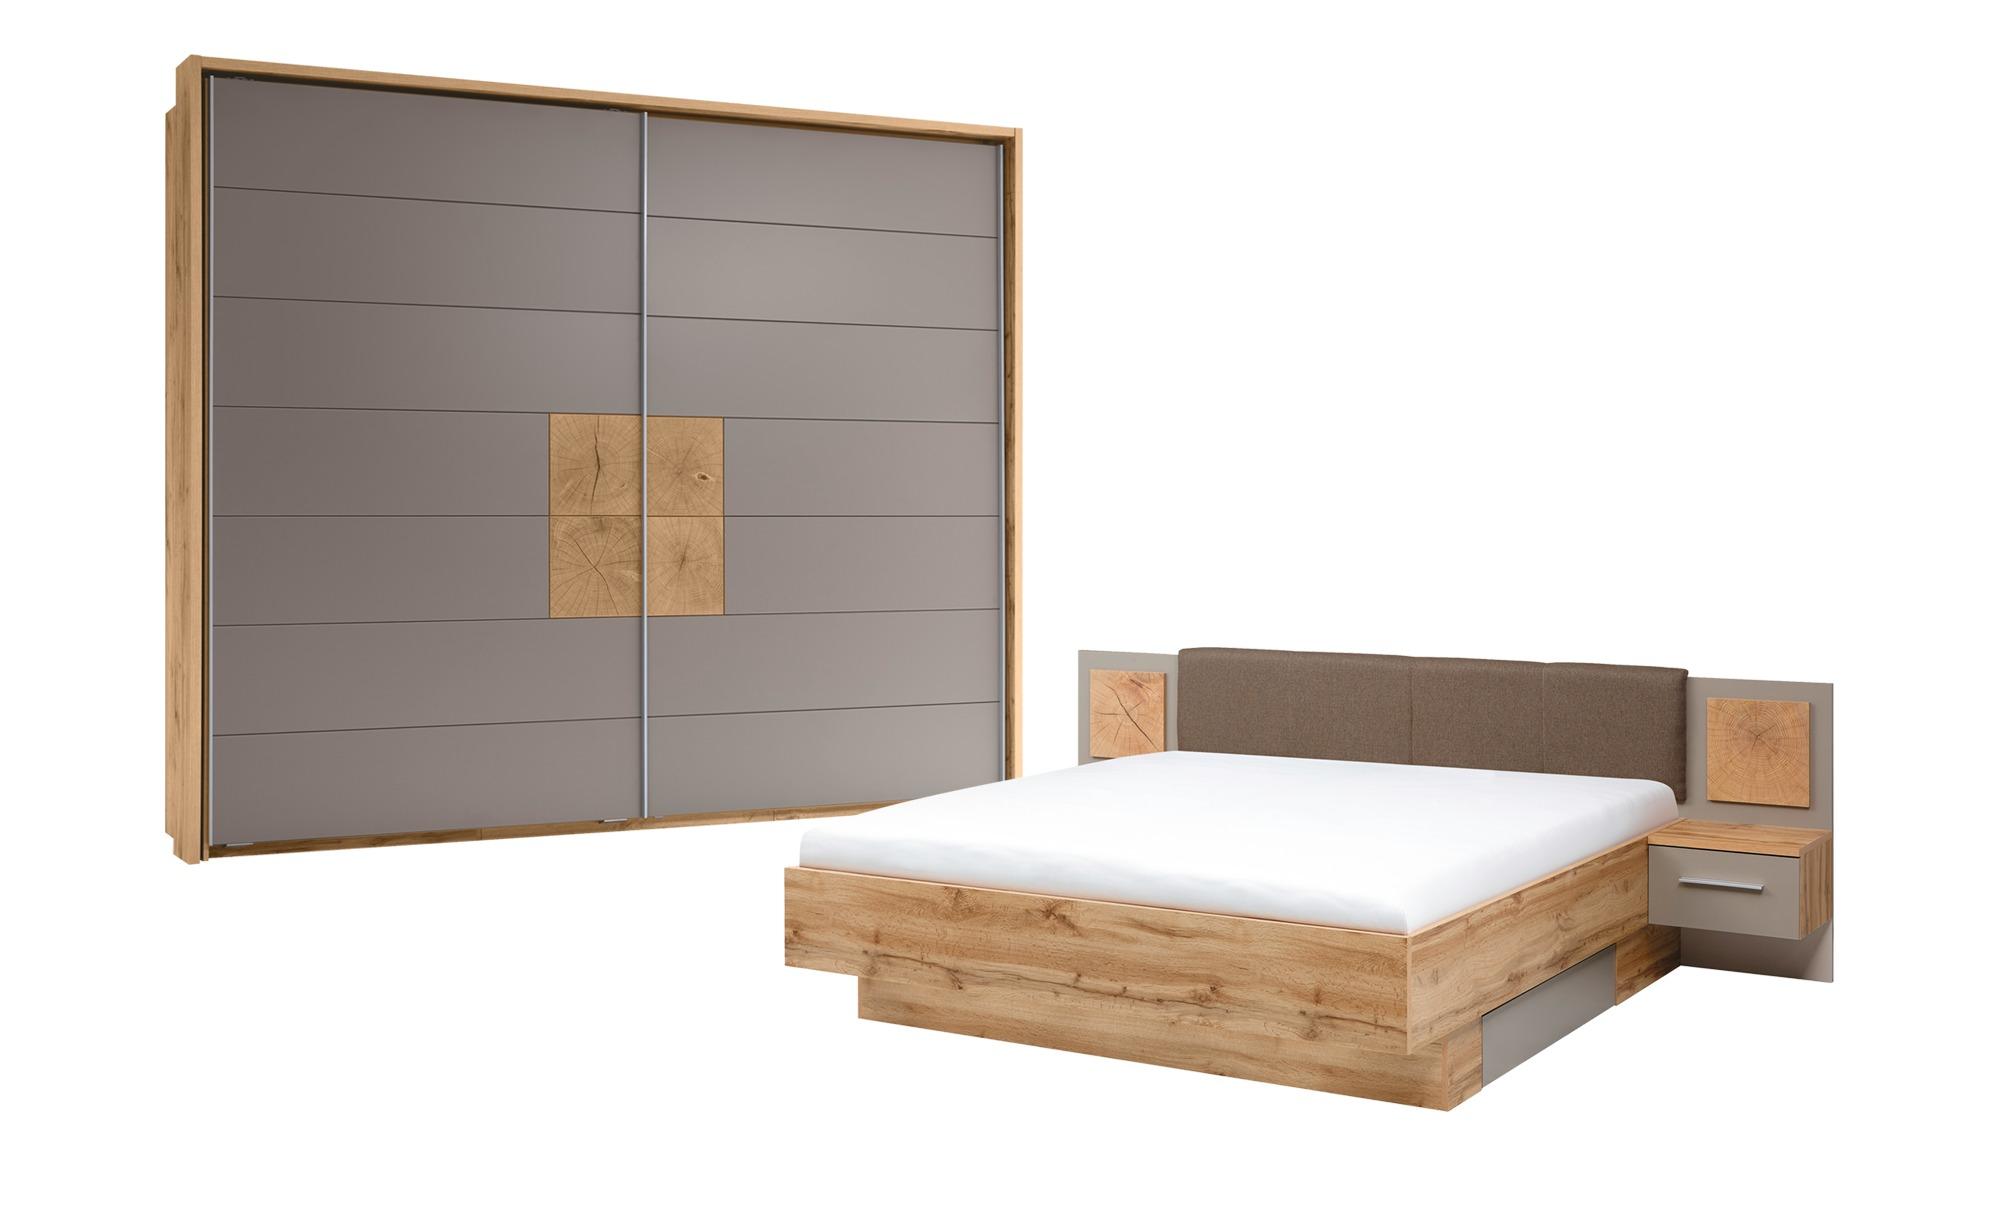 Uno Schlafzimmer 4 Teilig Mit Bettkasten Campus In 2019 Products Bedroom Furniture Bedroom Furniture Sets Bedroom